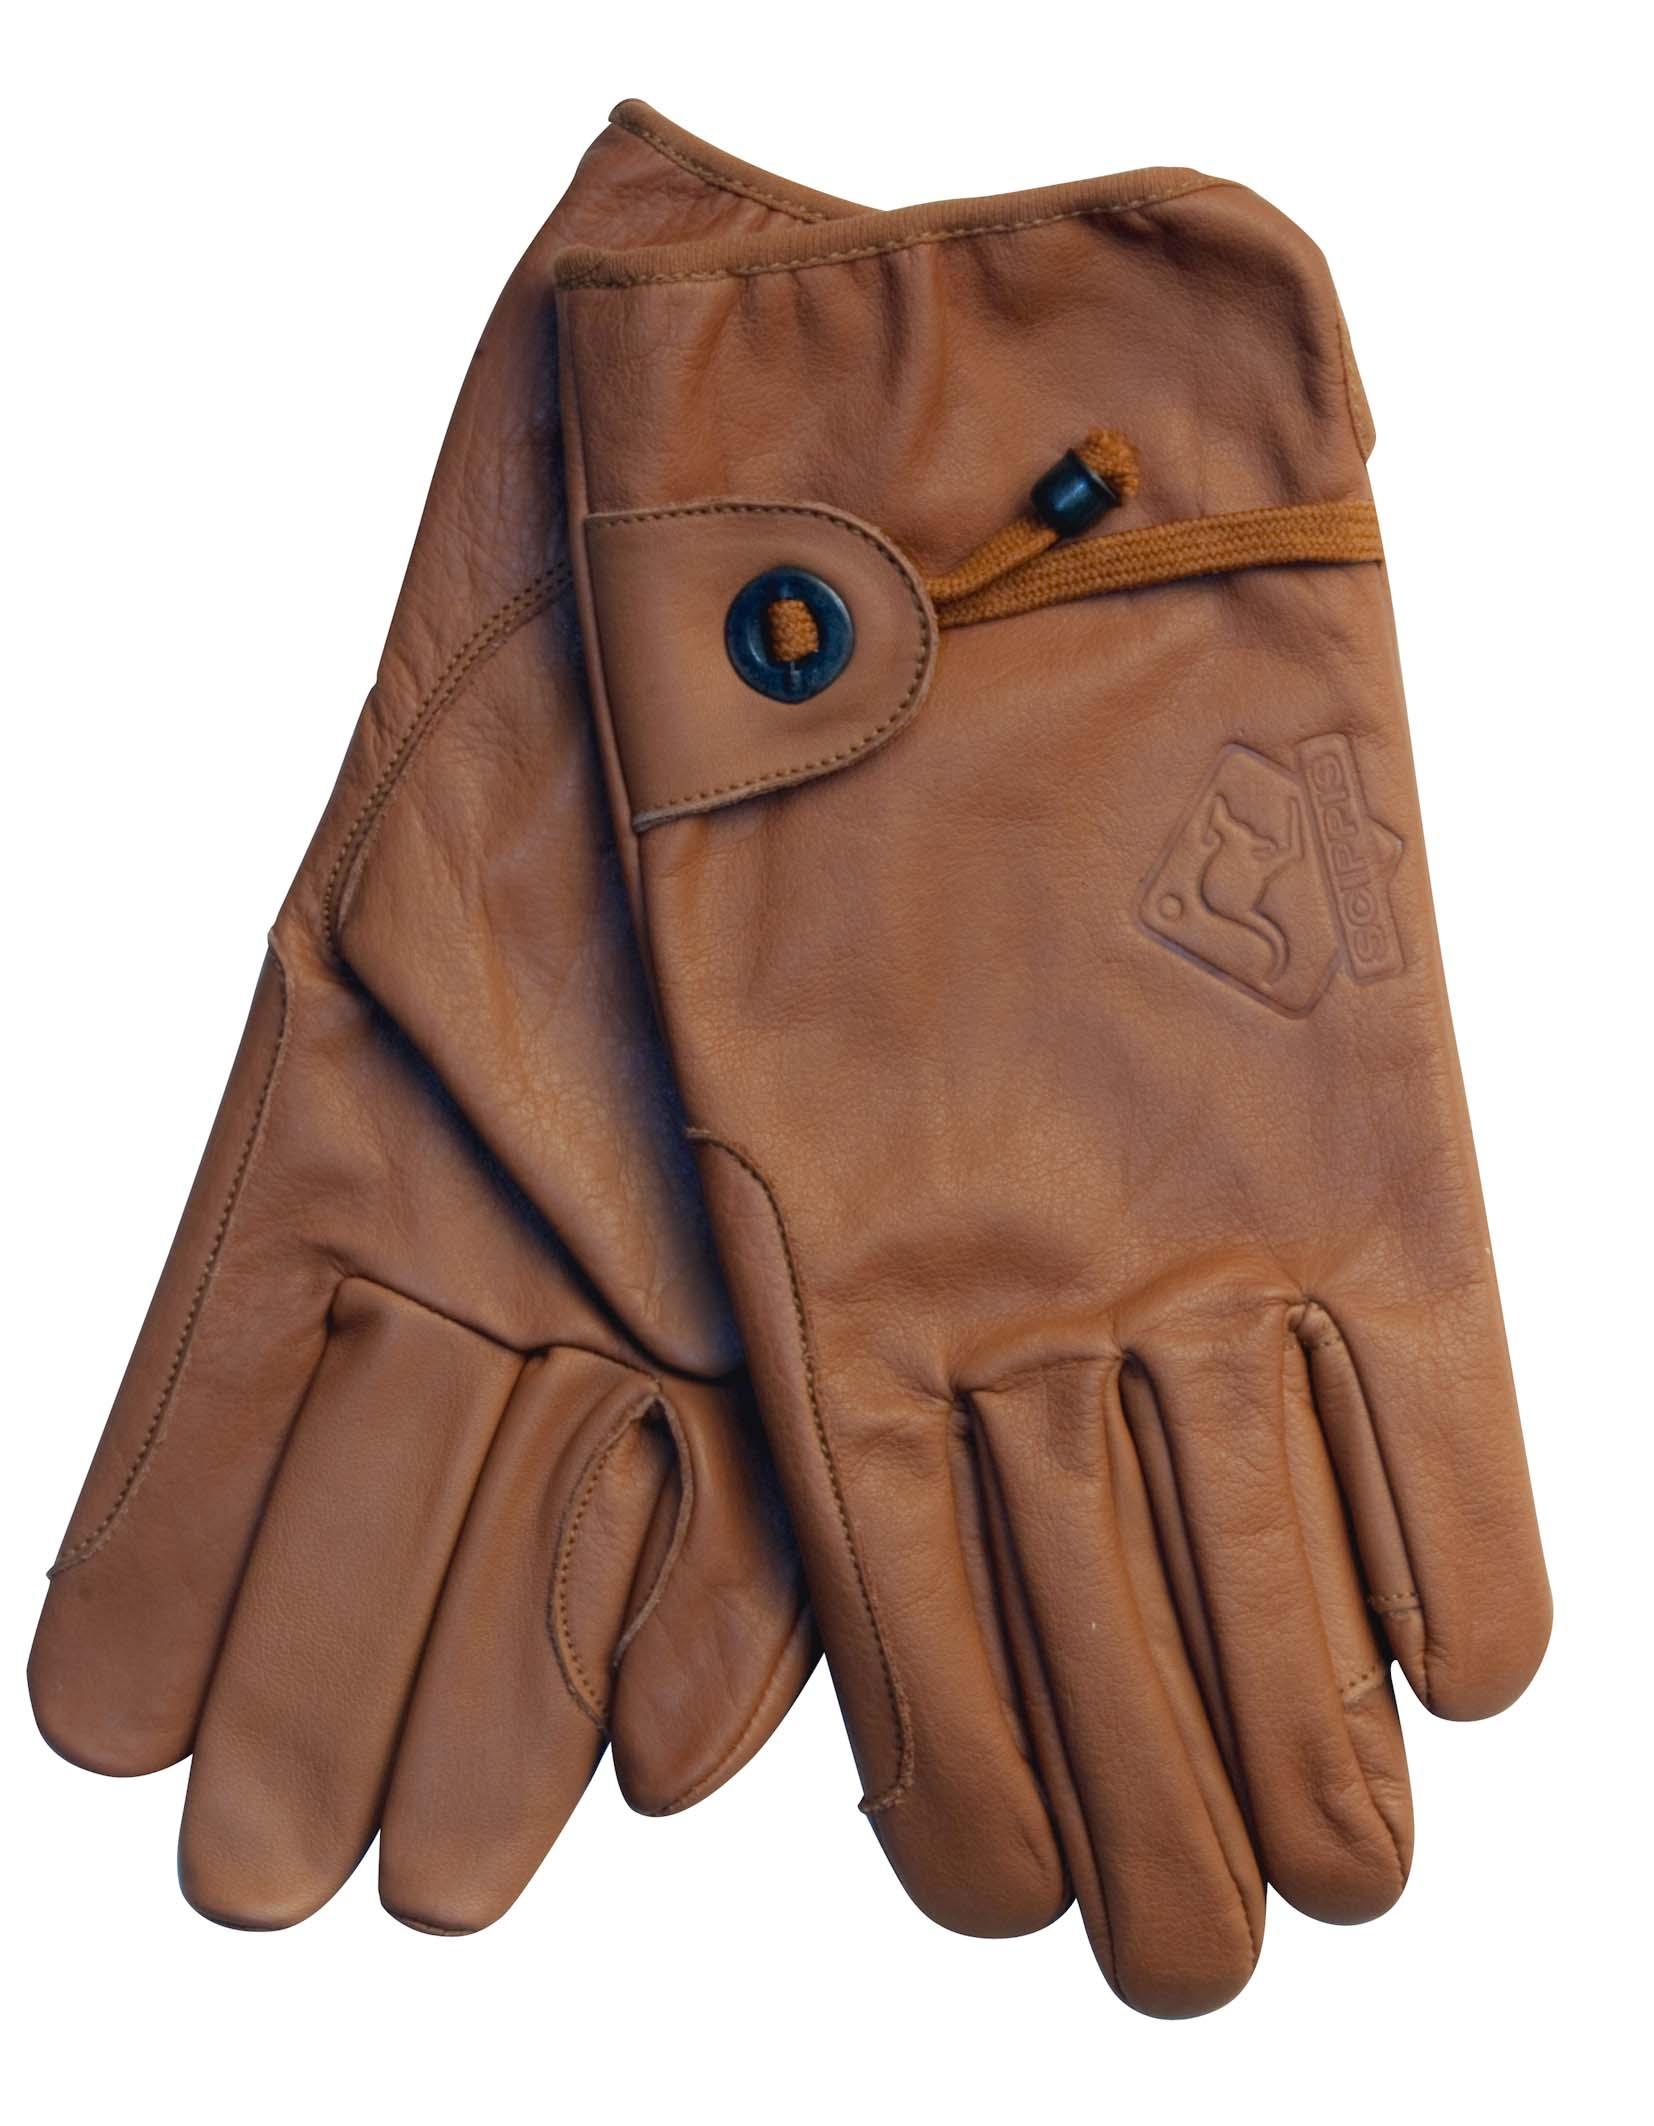 Scippis Leder Handschuhe-Braun-S